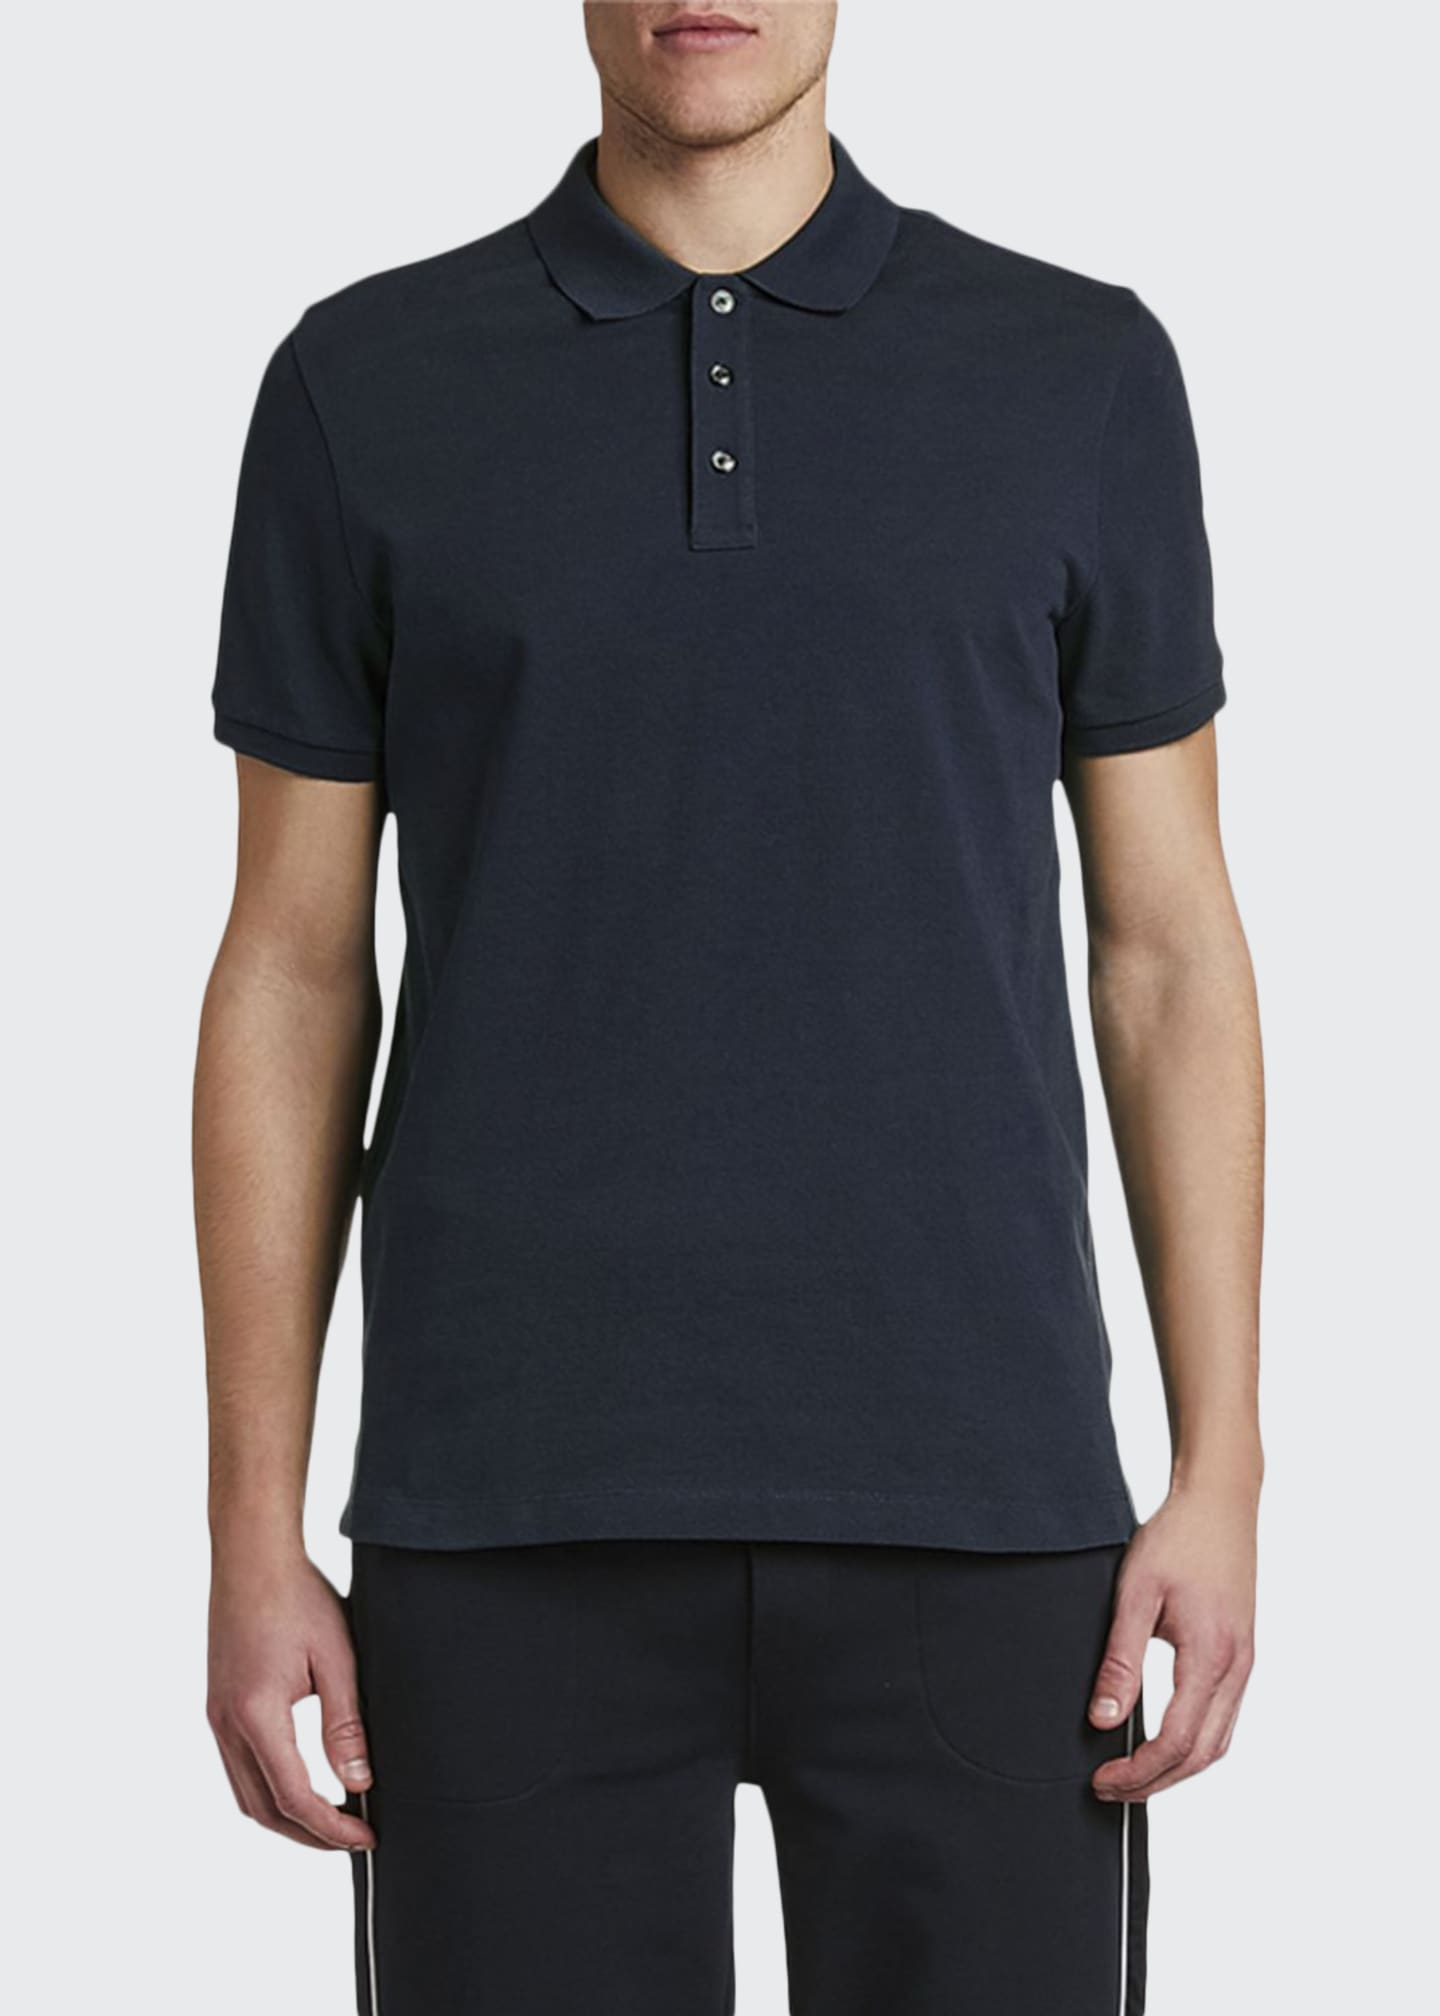 Moncler Men's Classic Solid Polo Shirt